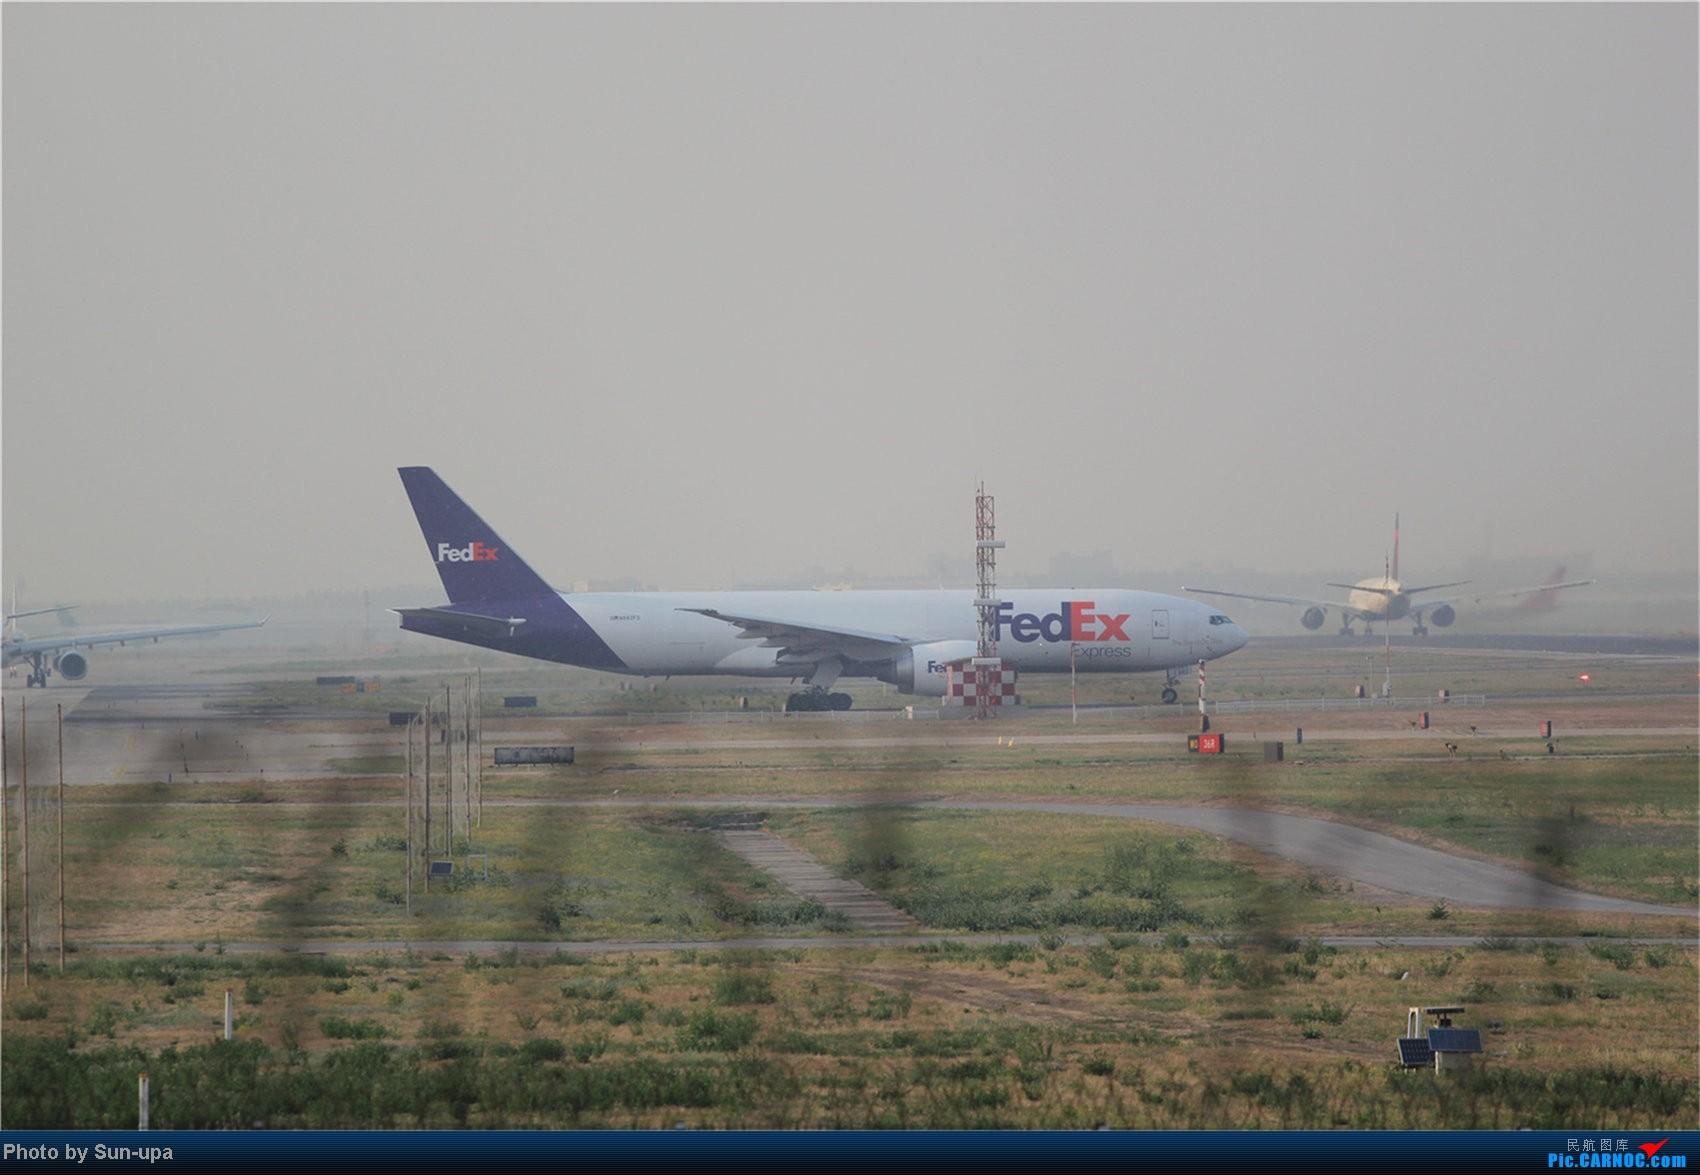 Re:[原创]【Sun-upa】老图新发 前段时间pek杂图+11.7机场内随拍 BOEING 777  中国北京首都机场